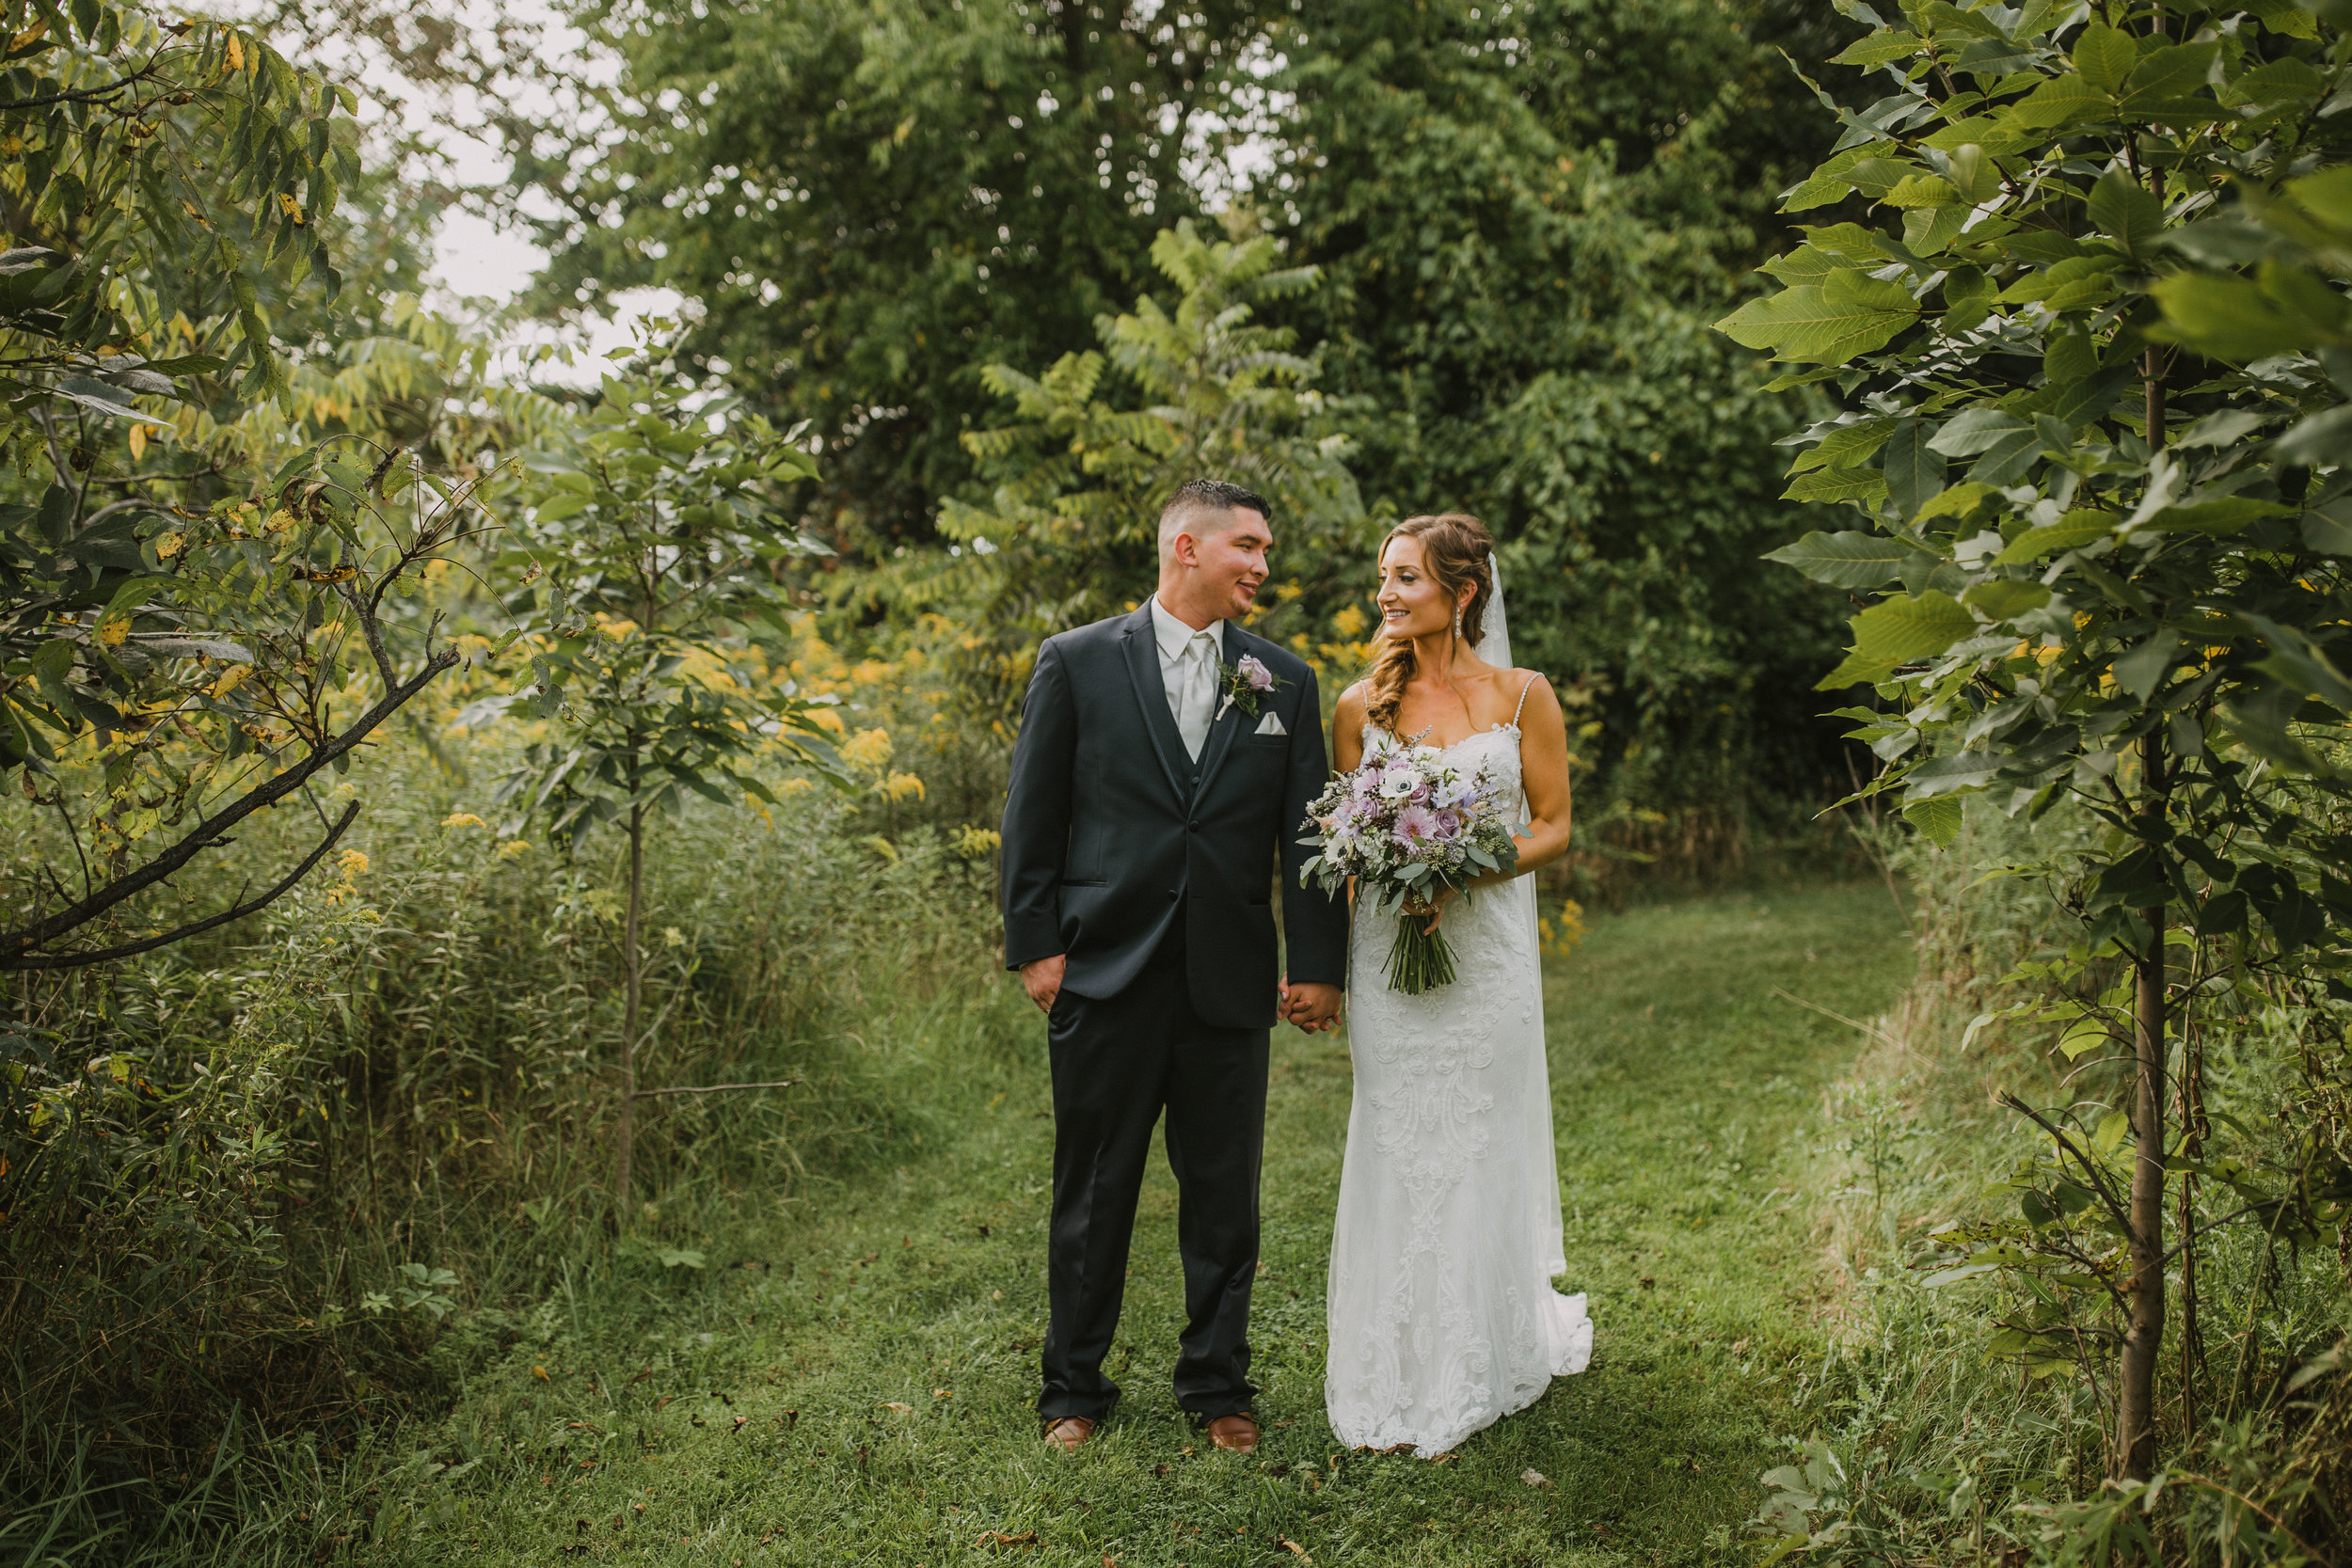 A&C-Milwaukee Wedding Photographer Videographer-393.jpg